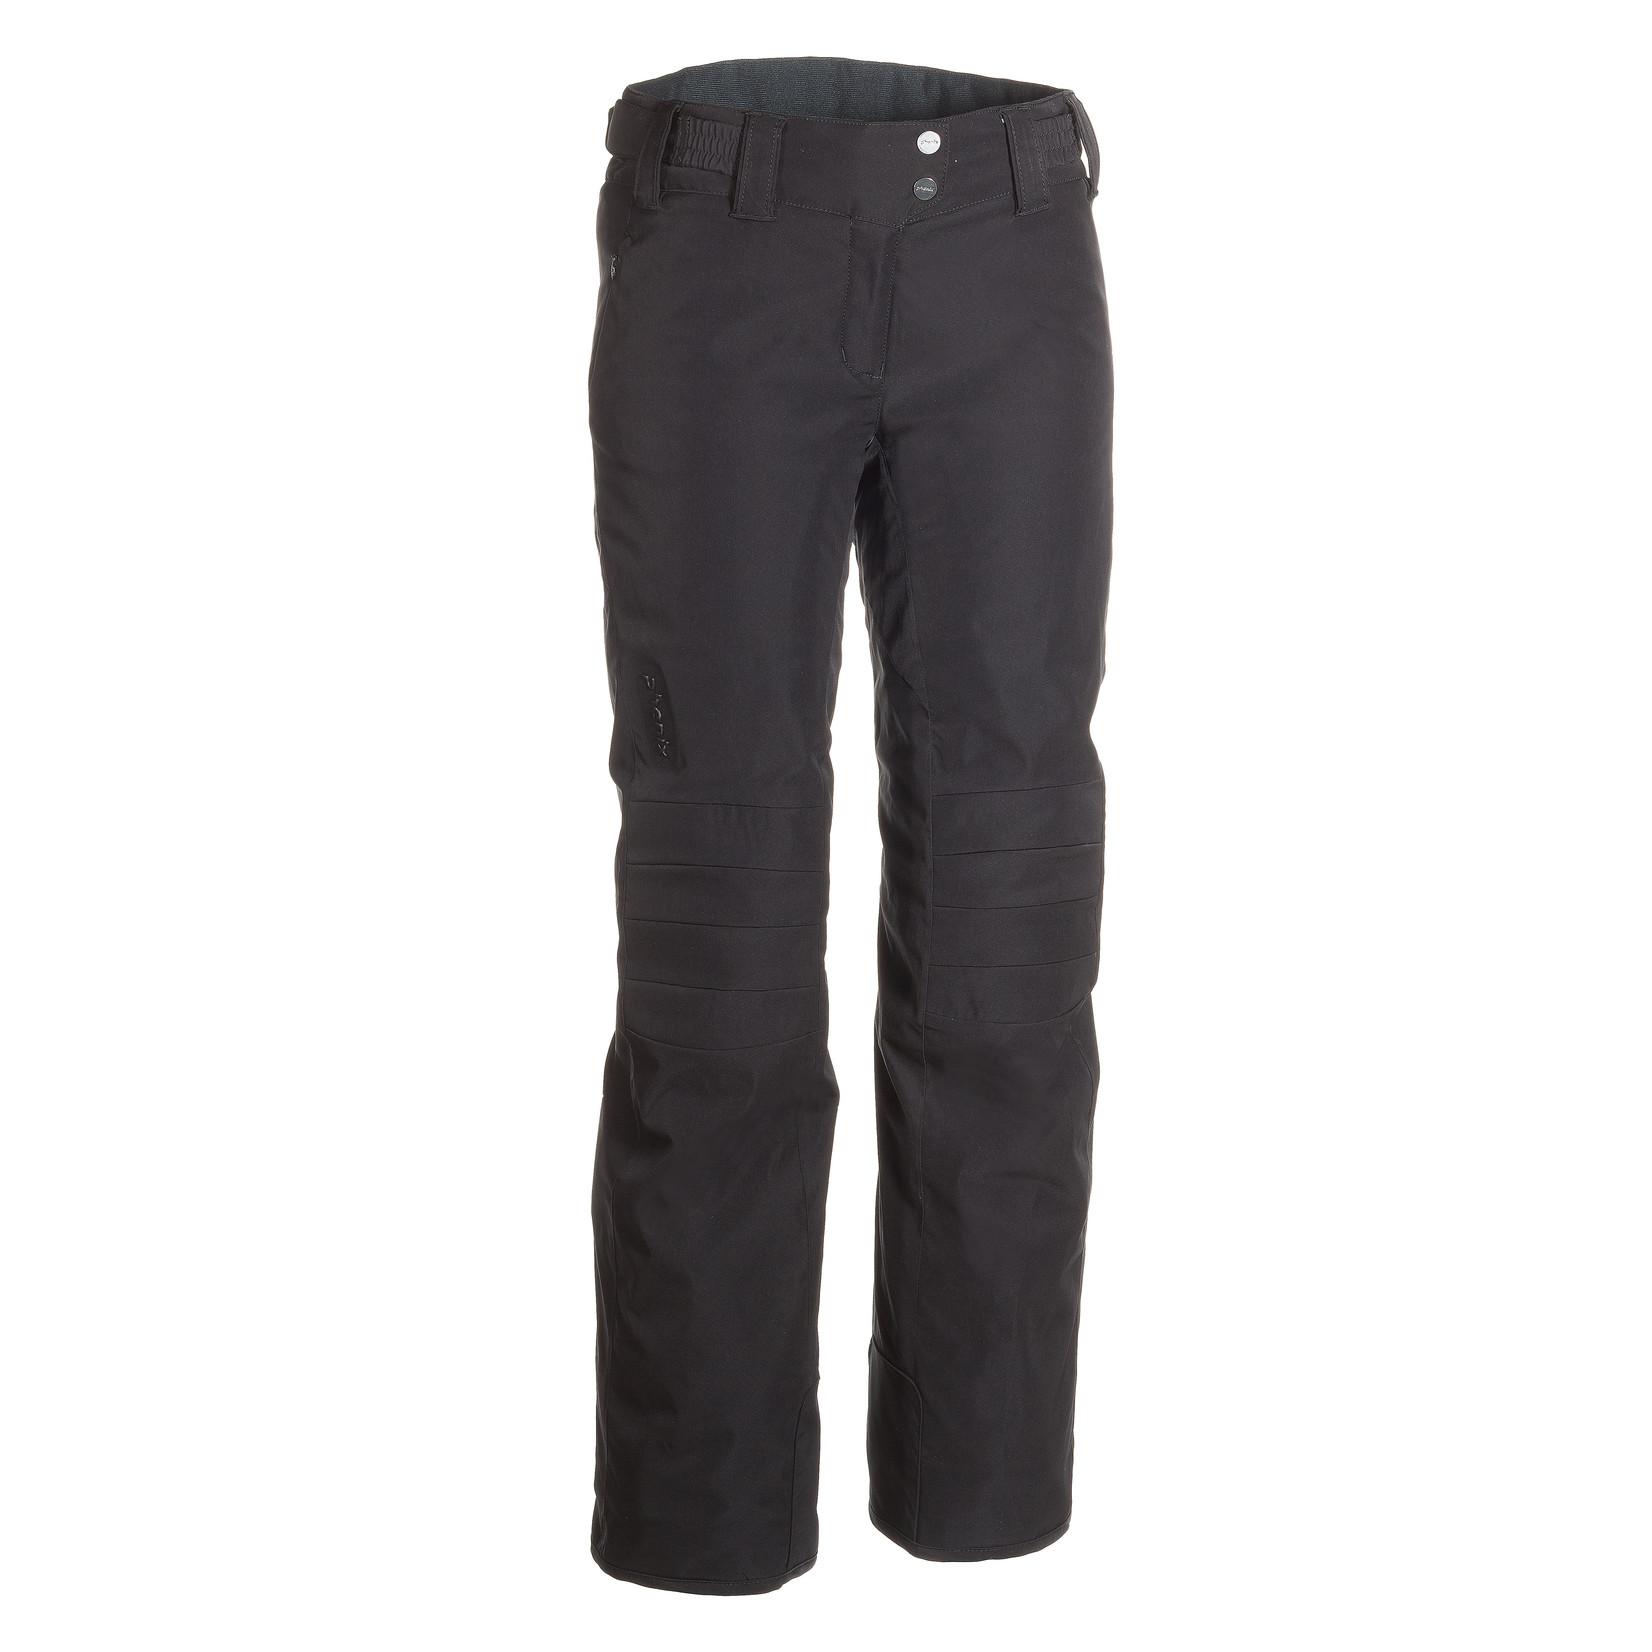 PHENIX Rose Waist Pants